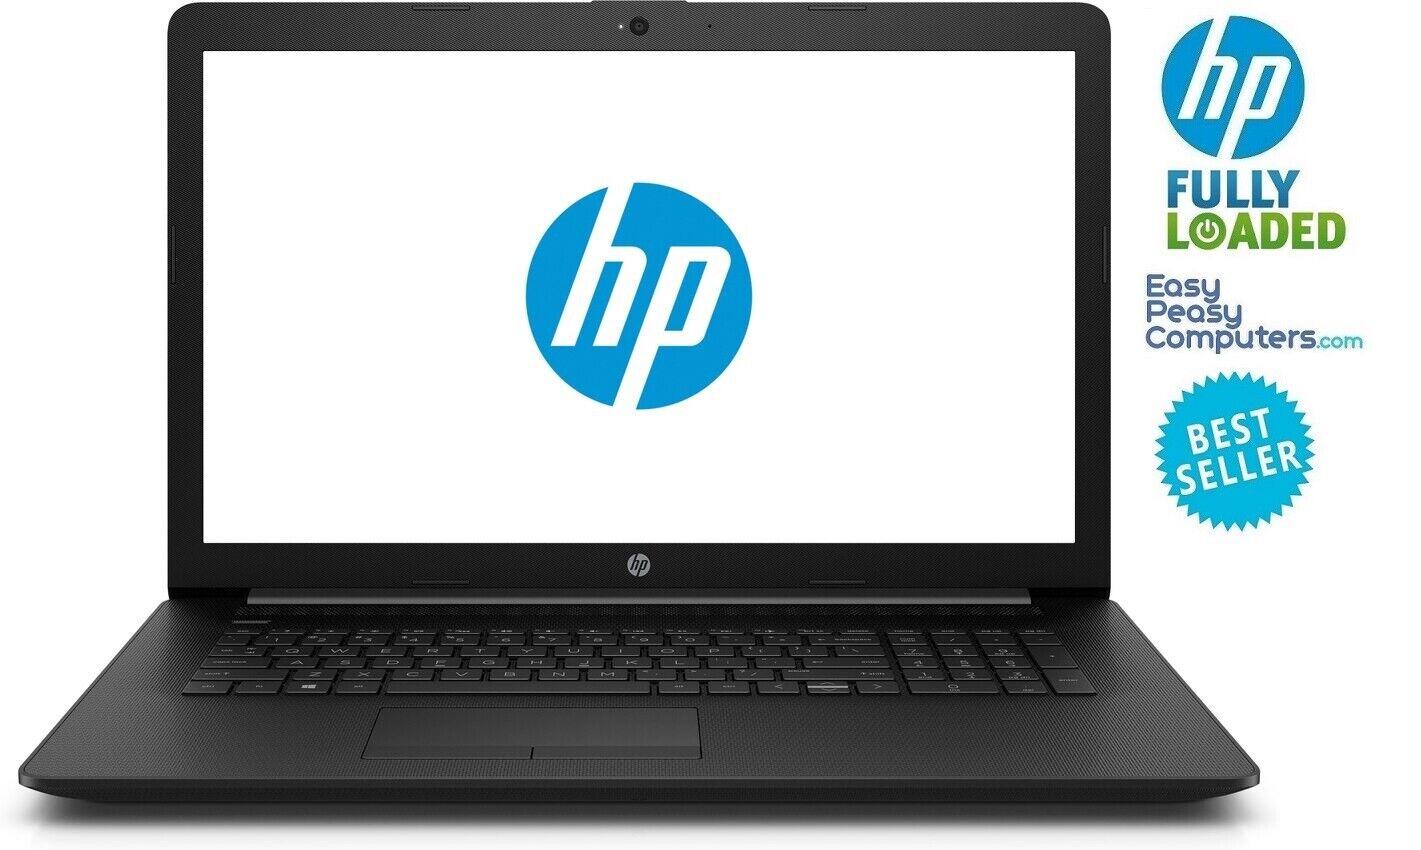 "Laptop Windows - HP Laptop 17.3"" Windows 10 8GB 1TB DVD+RW WiFi Bluetooth WEBCAM (FULLY LOADED)"